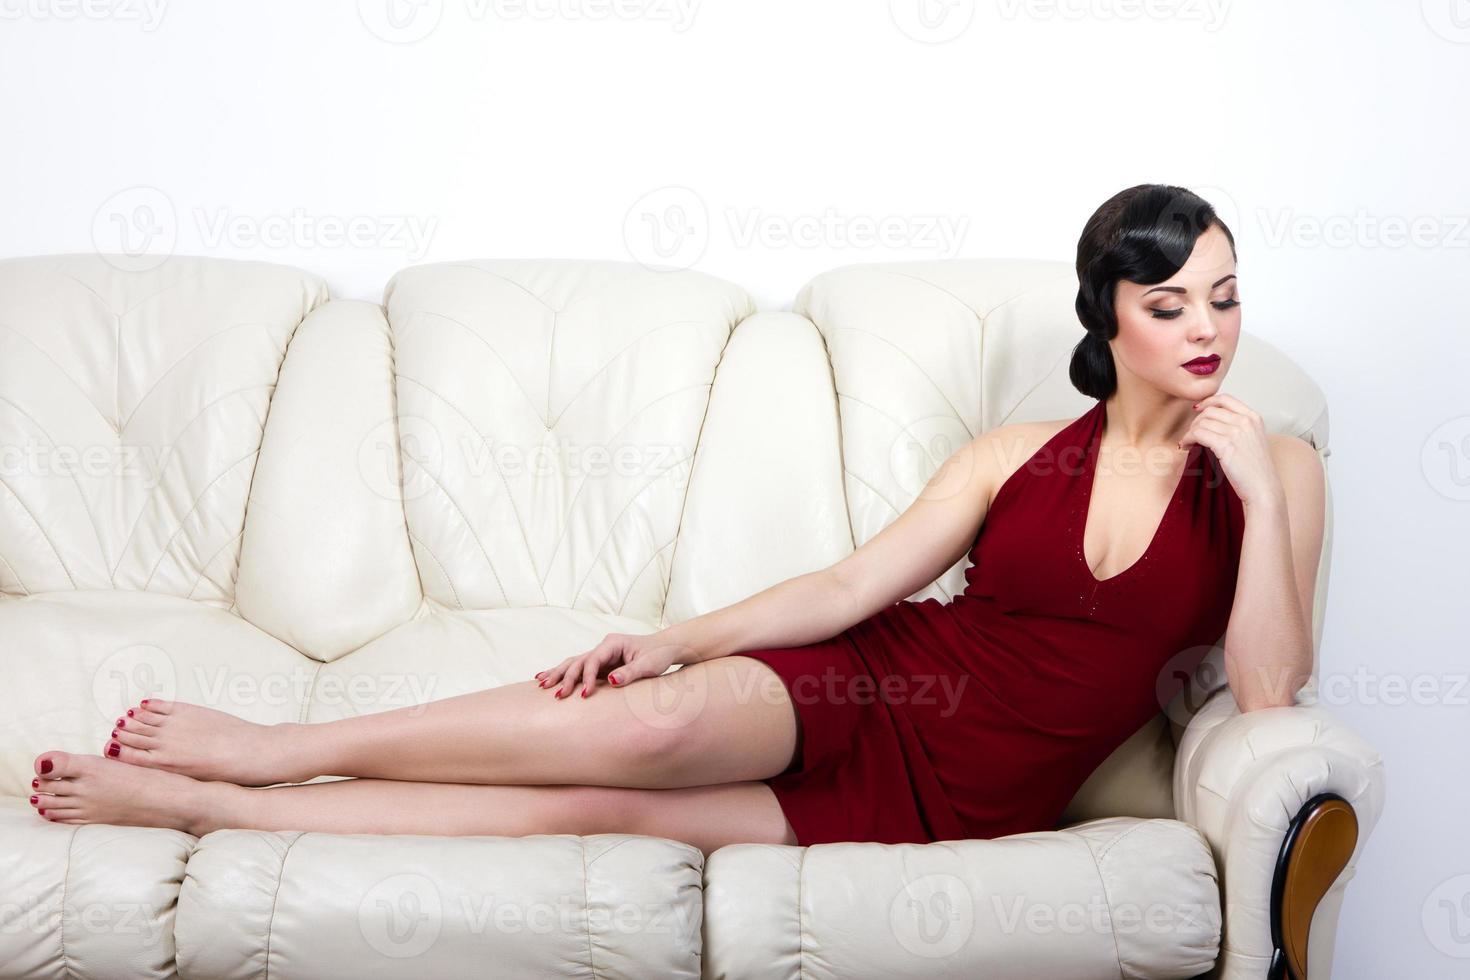 Brünette Frau im Retro-Stil, die auf dem Sofa liegt foto